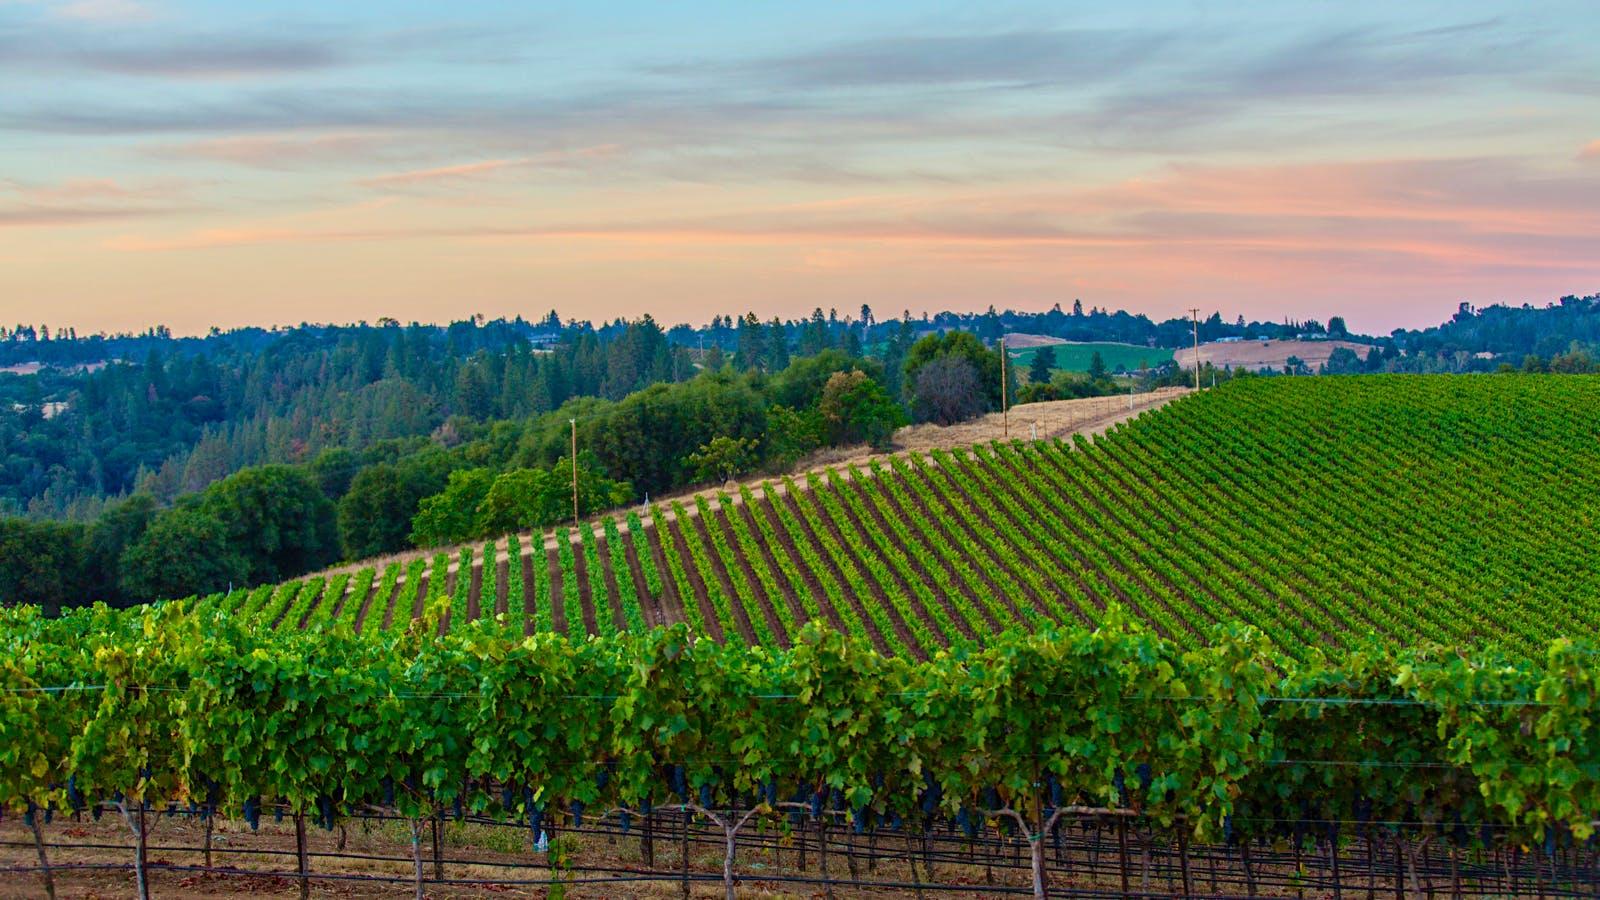 Exclusive: Rombauer Vineyards Buys Renwood's Winery in Amador County